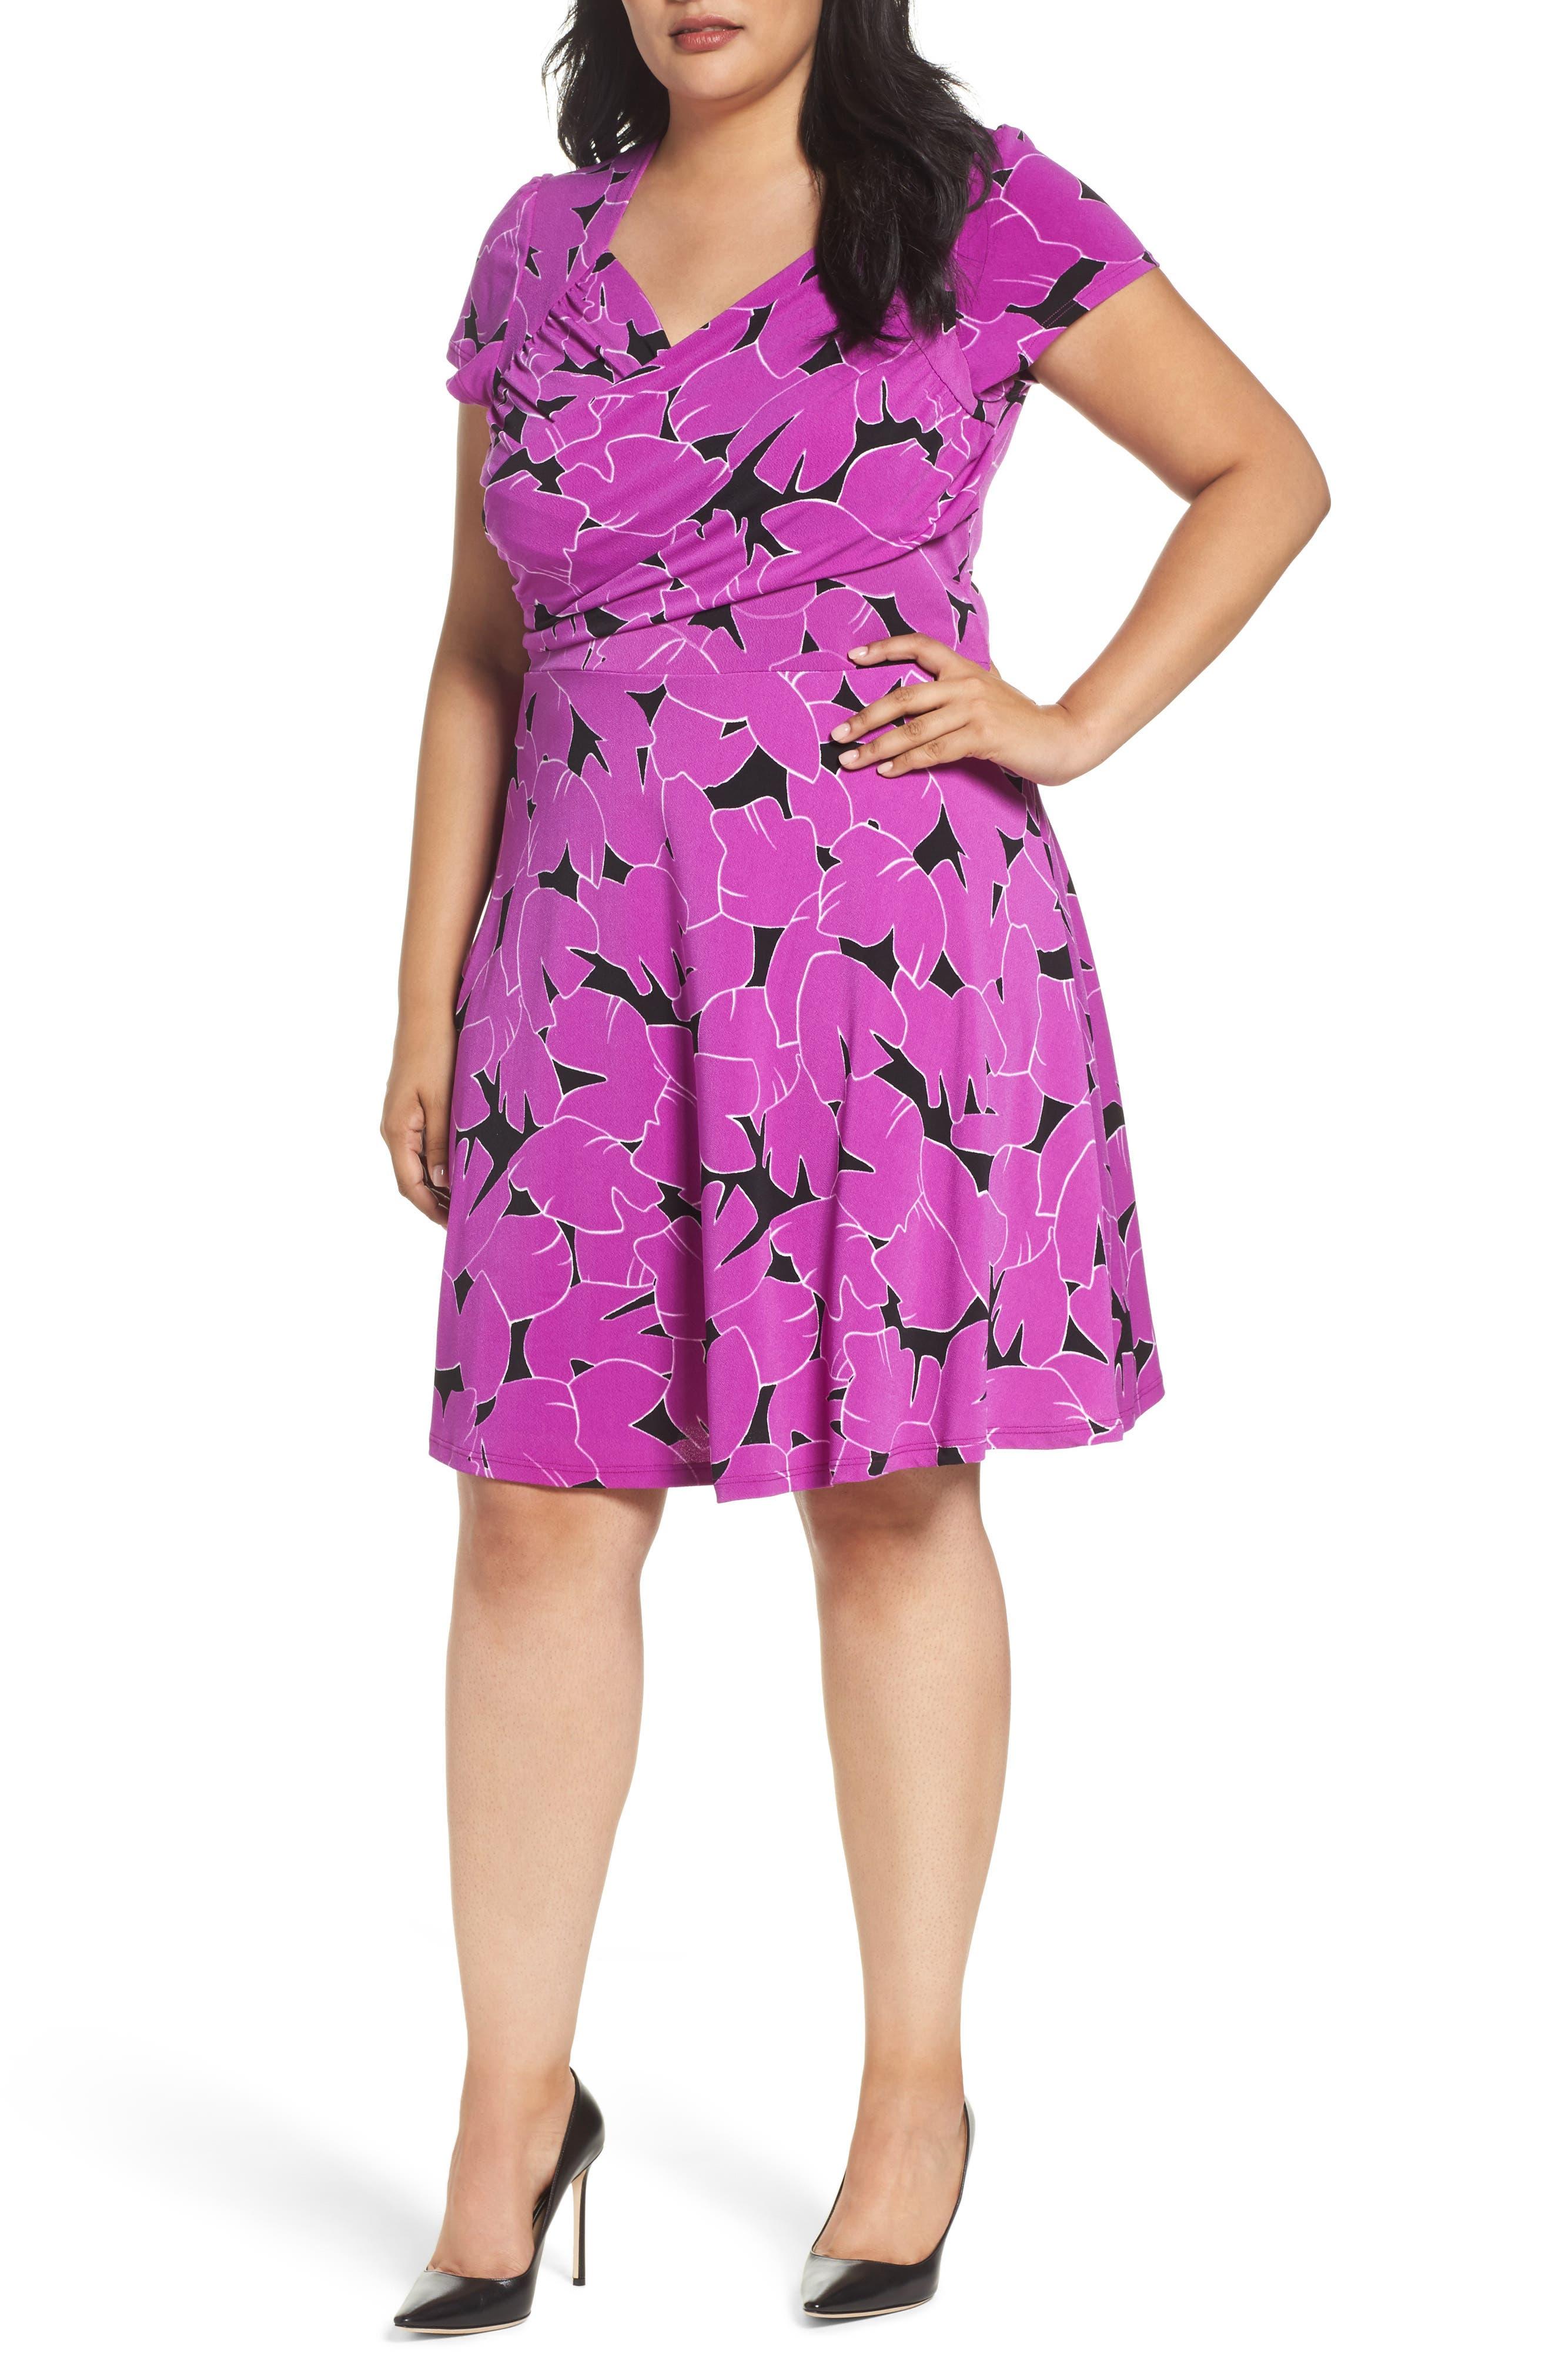 Alternate Image 1 Selected - Leota Faux Wrap Jersey Dress (Plus Size)